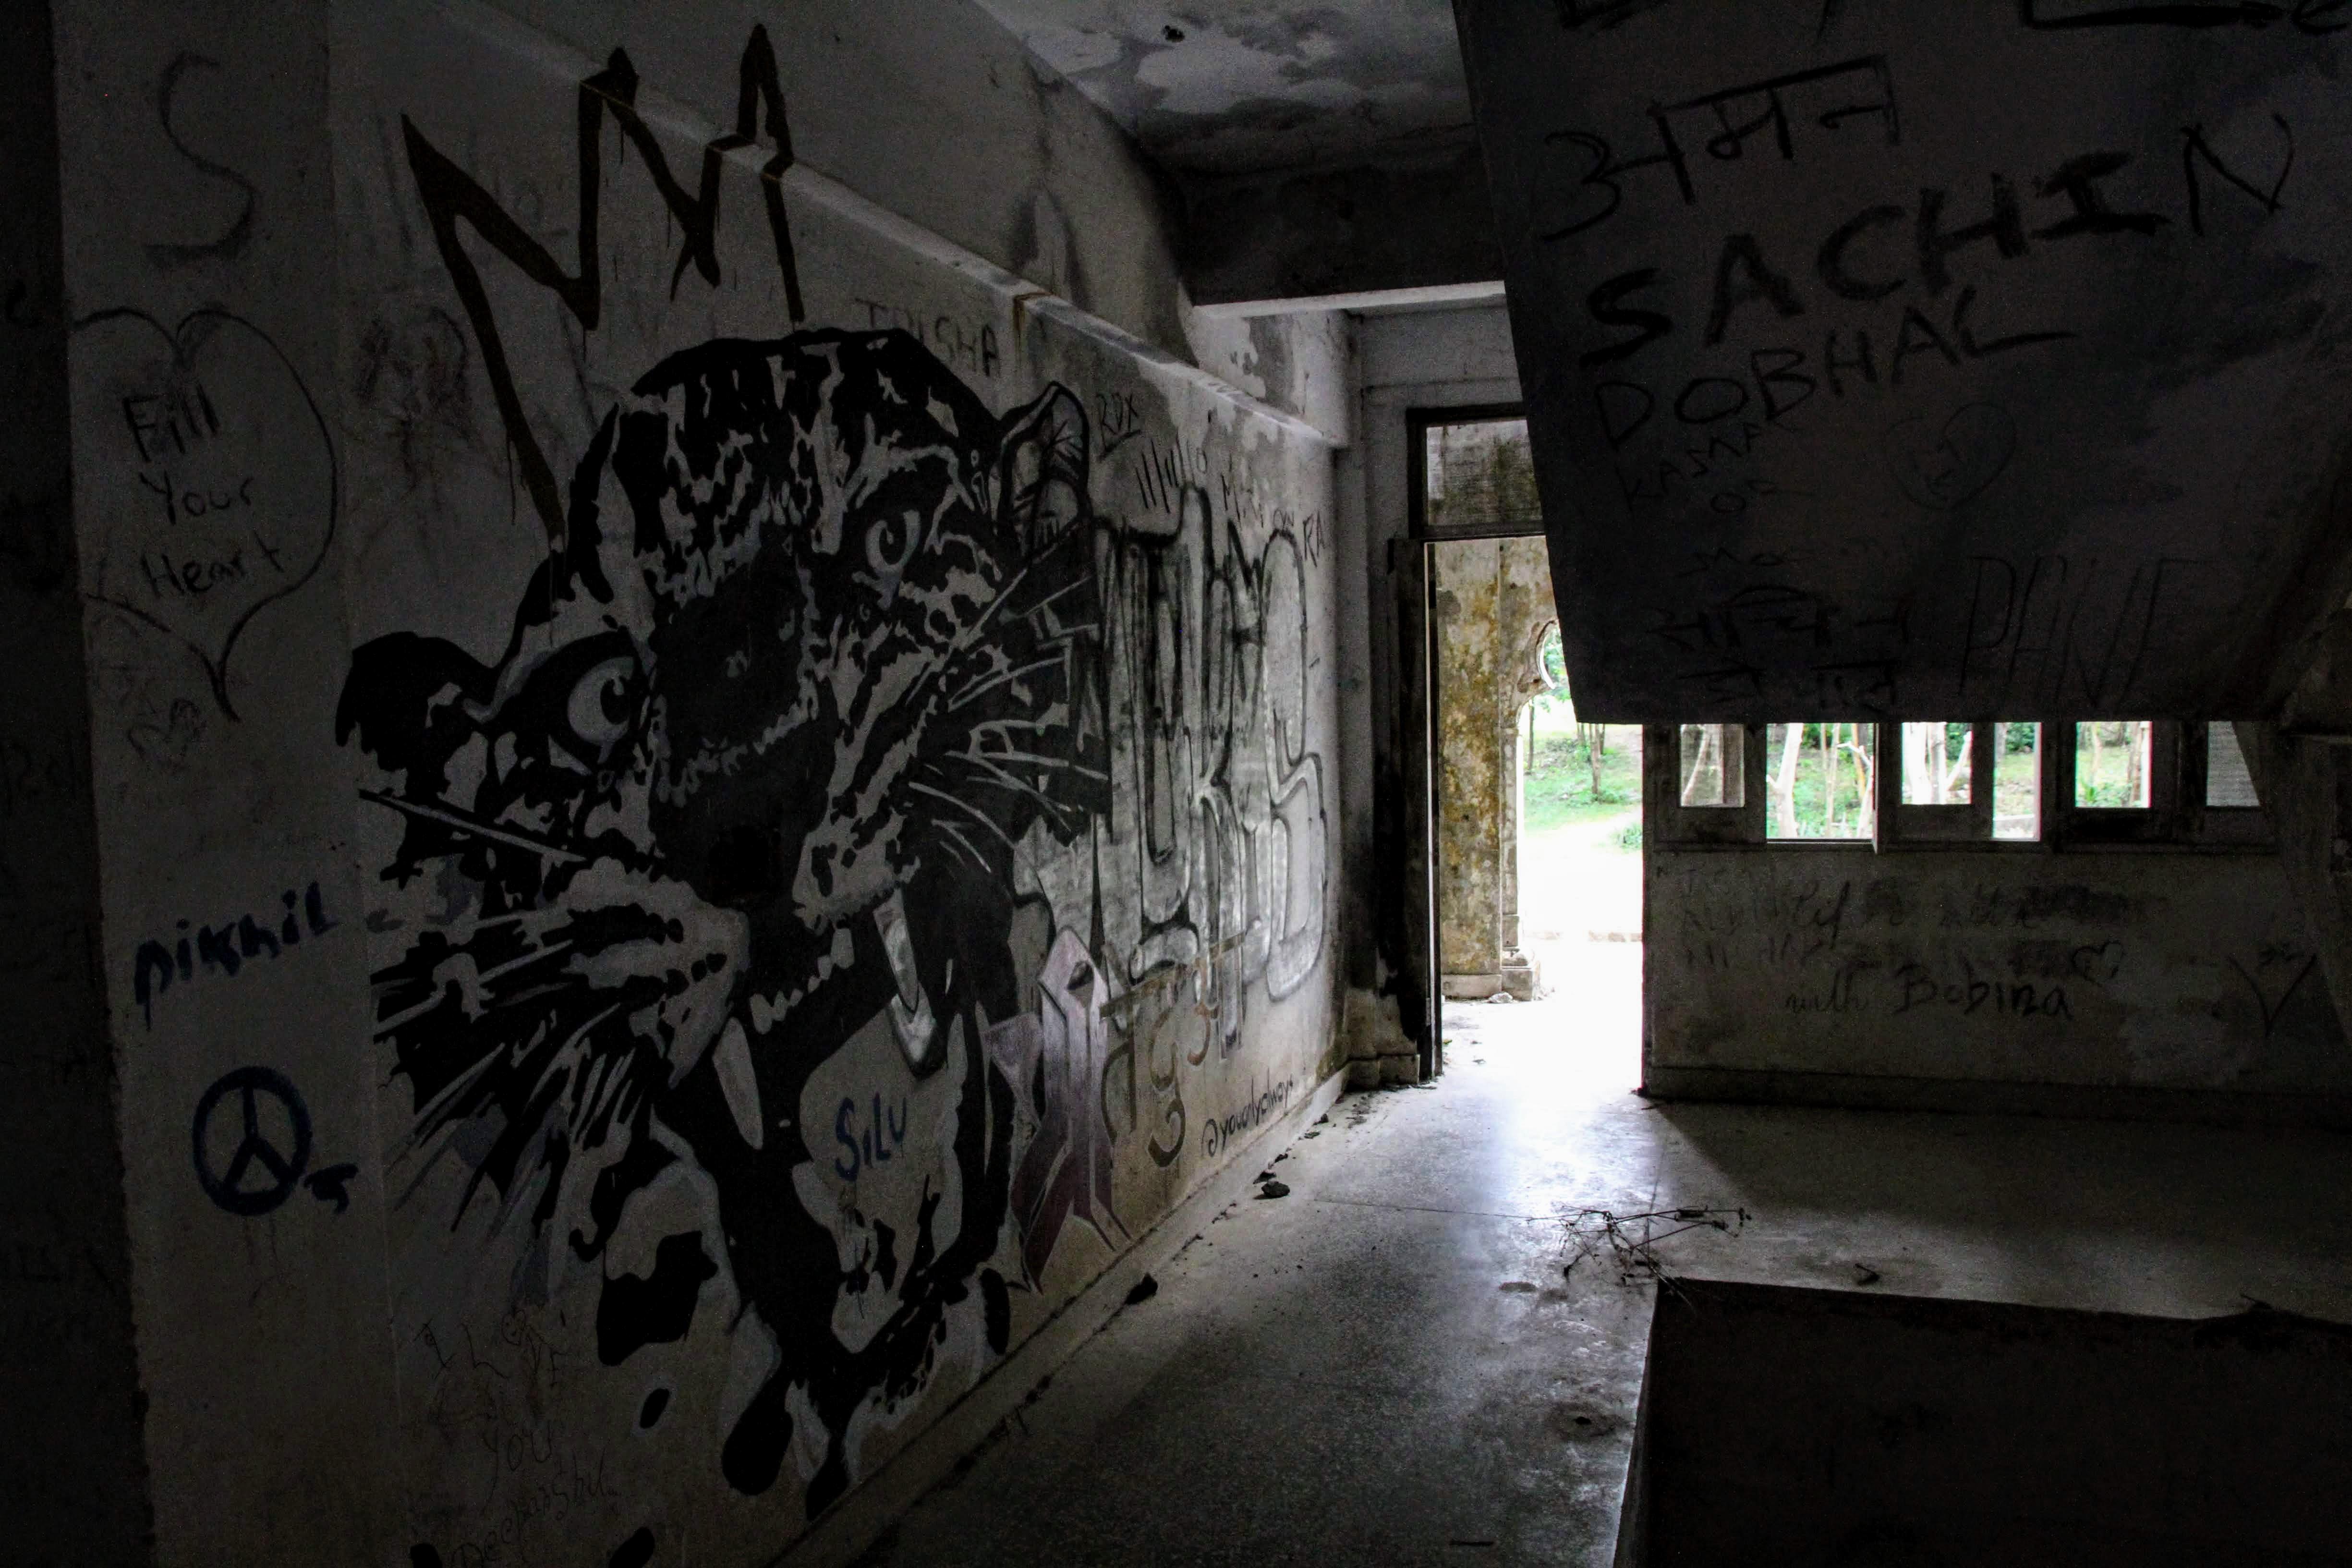 Tiger graffiti in the flats, The Beatles Ashram, Rishikesh